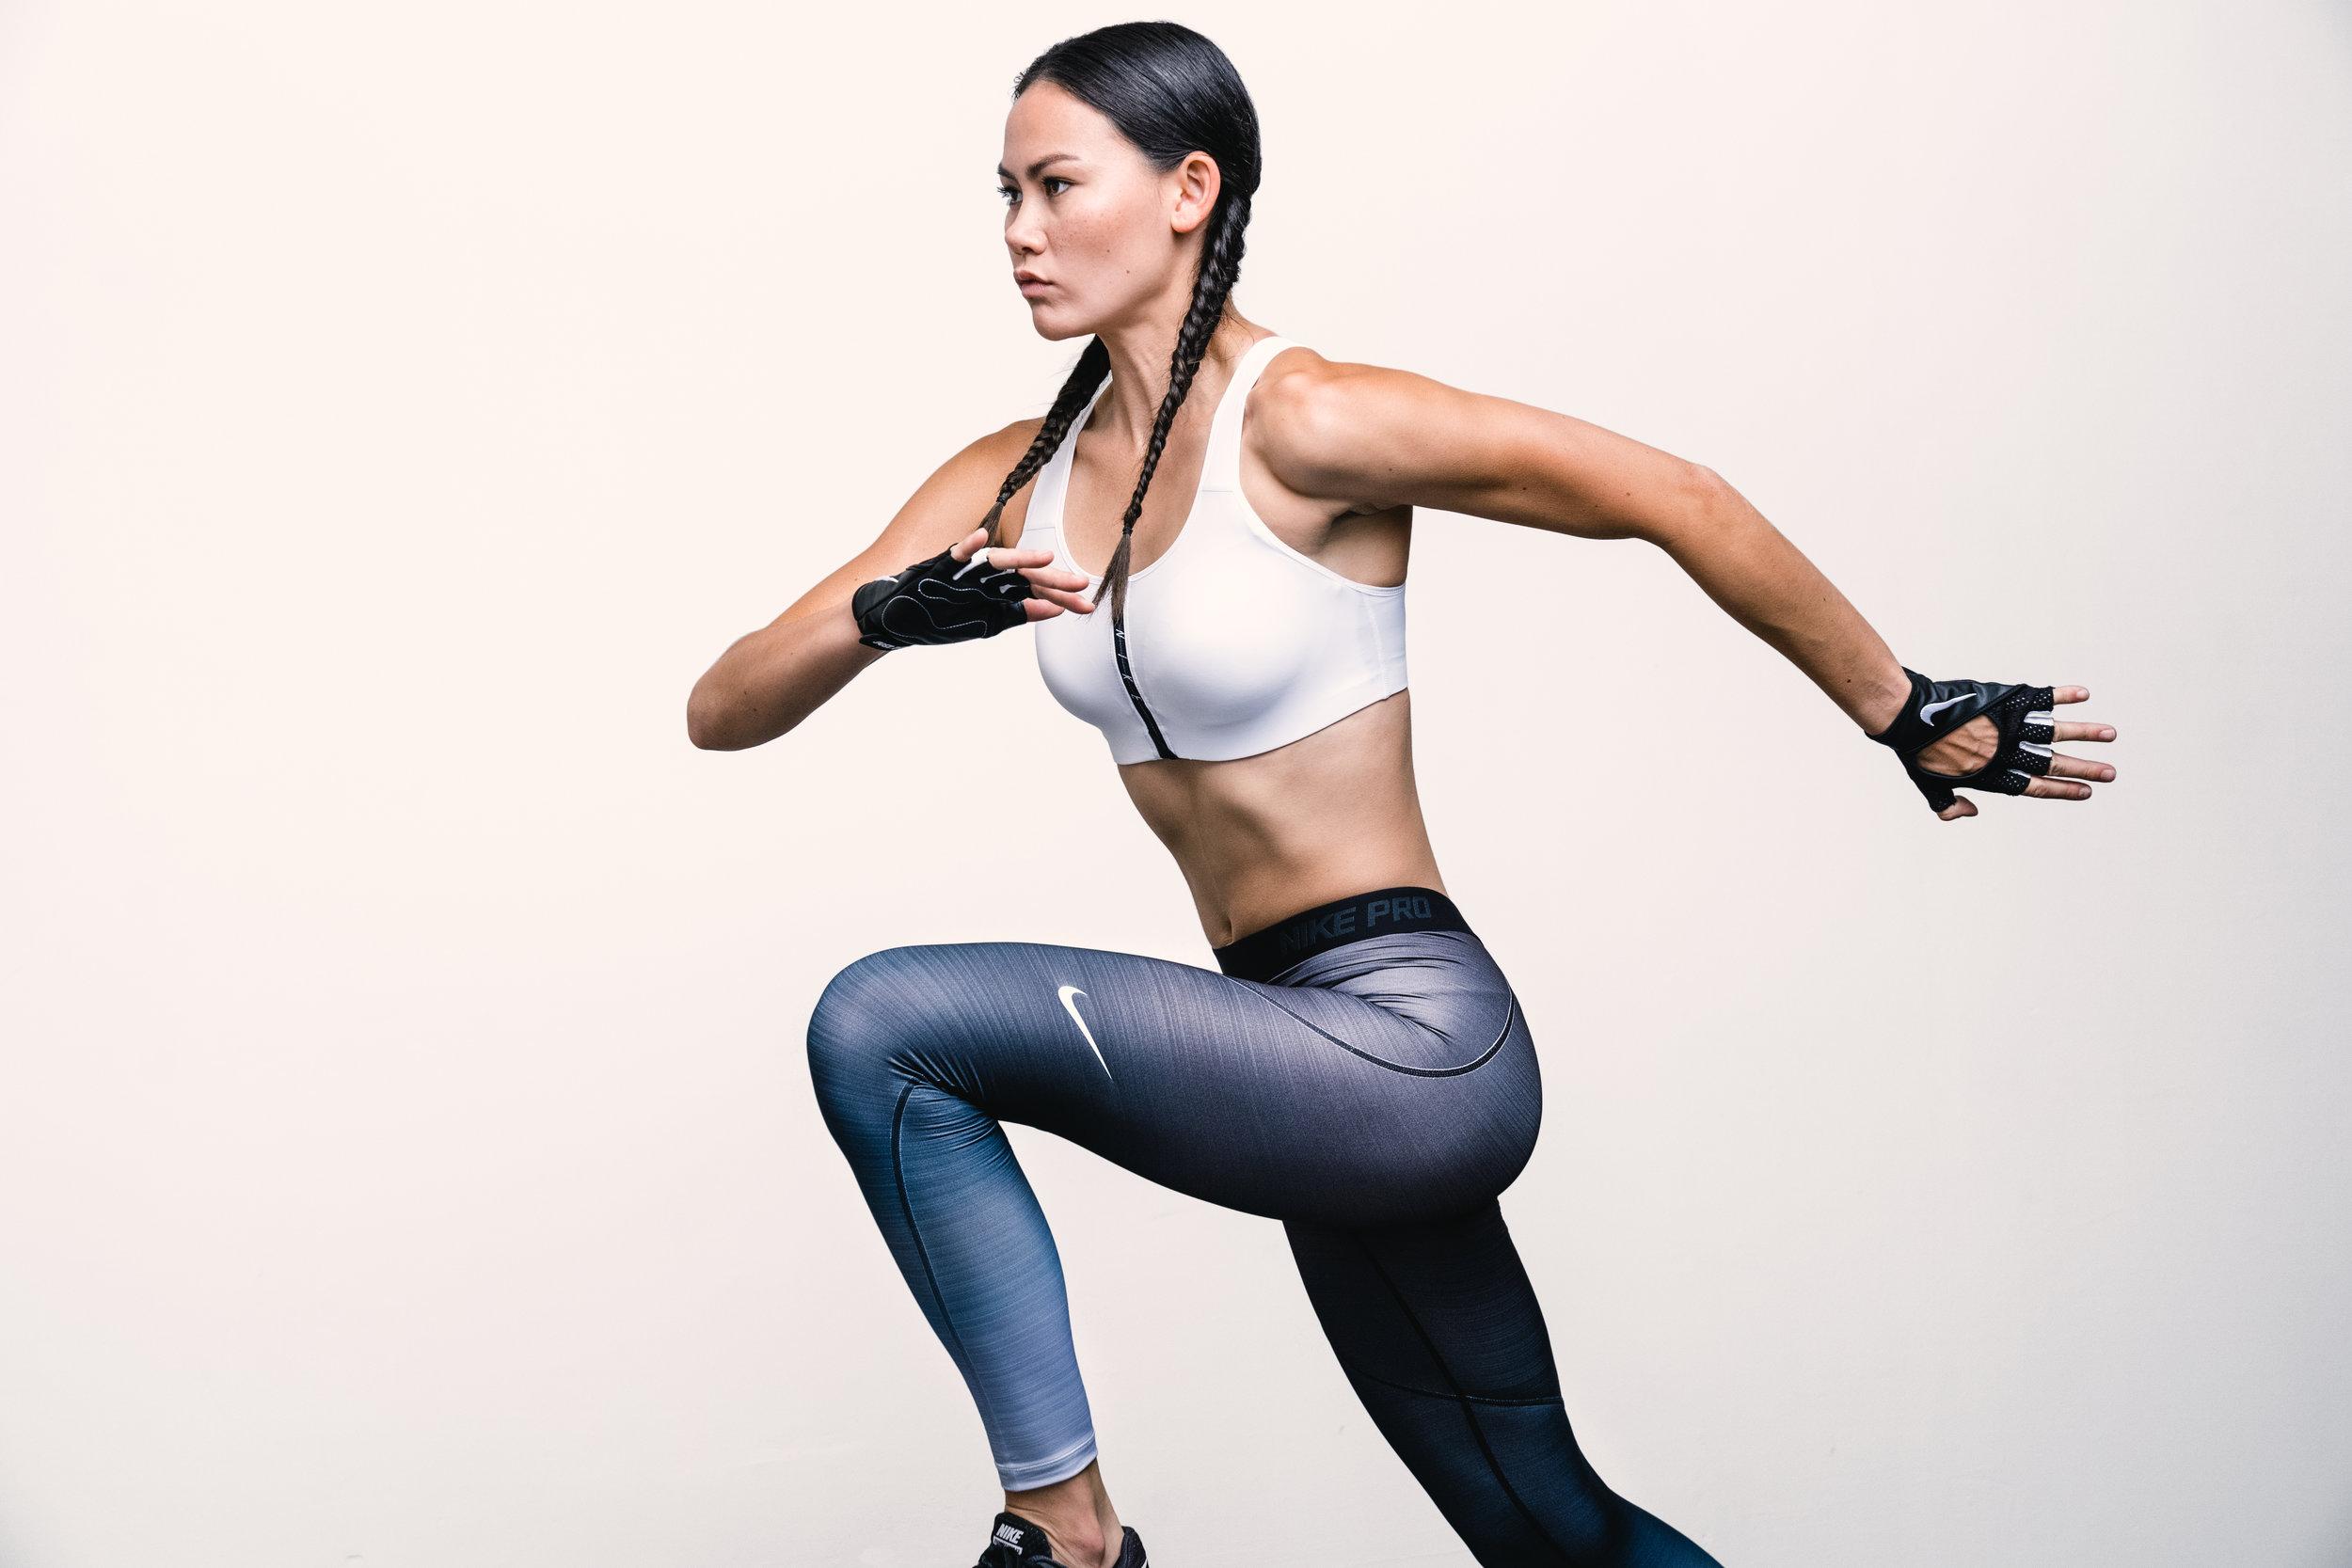 OBJKTV_MaxRes_Fitness_Nike Studio Shoot0342 (1).jpg